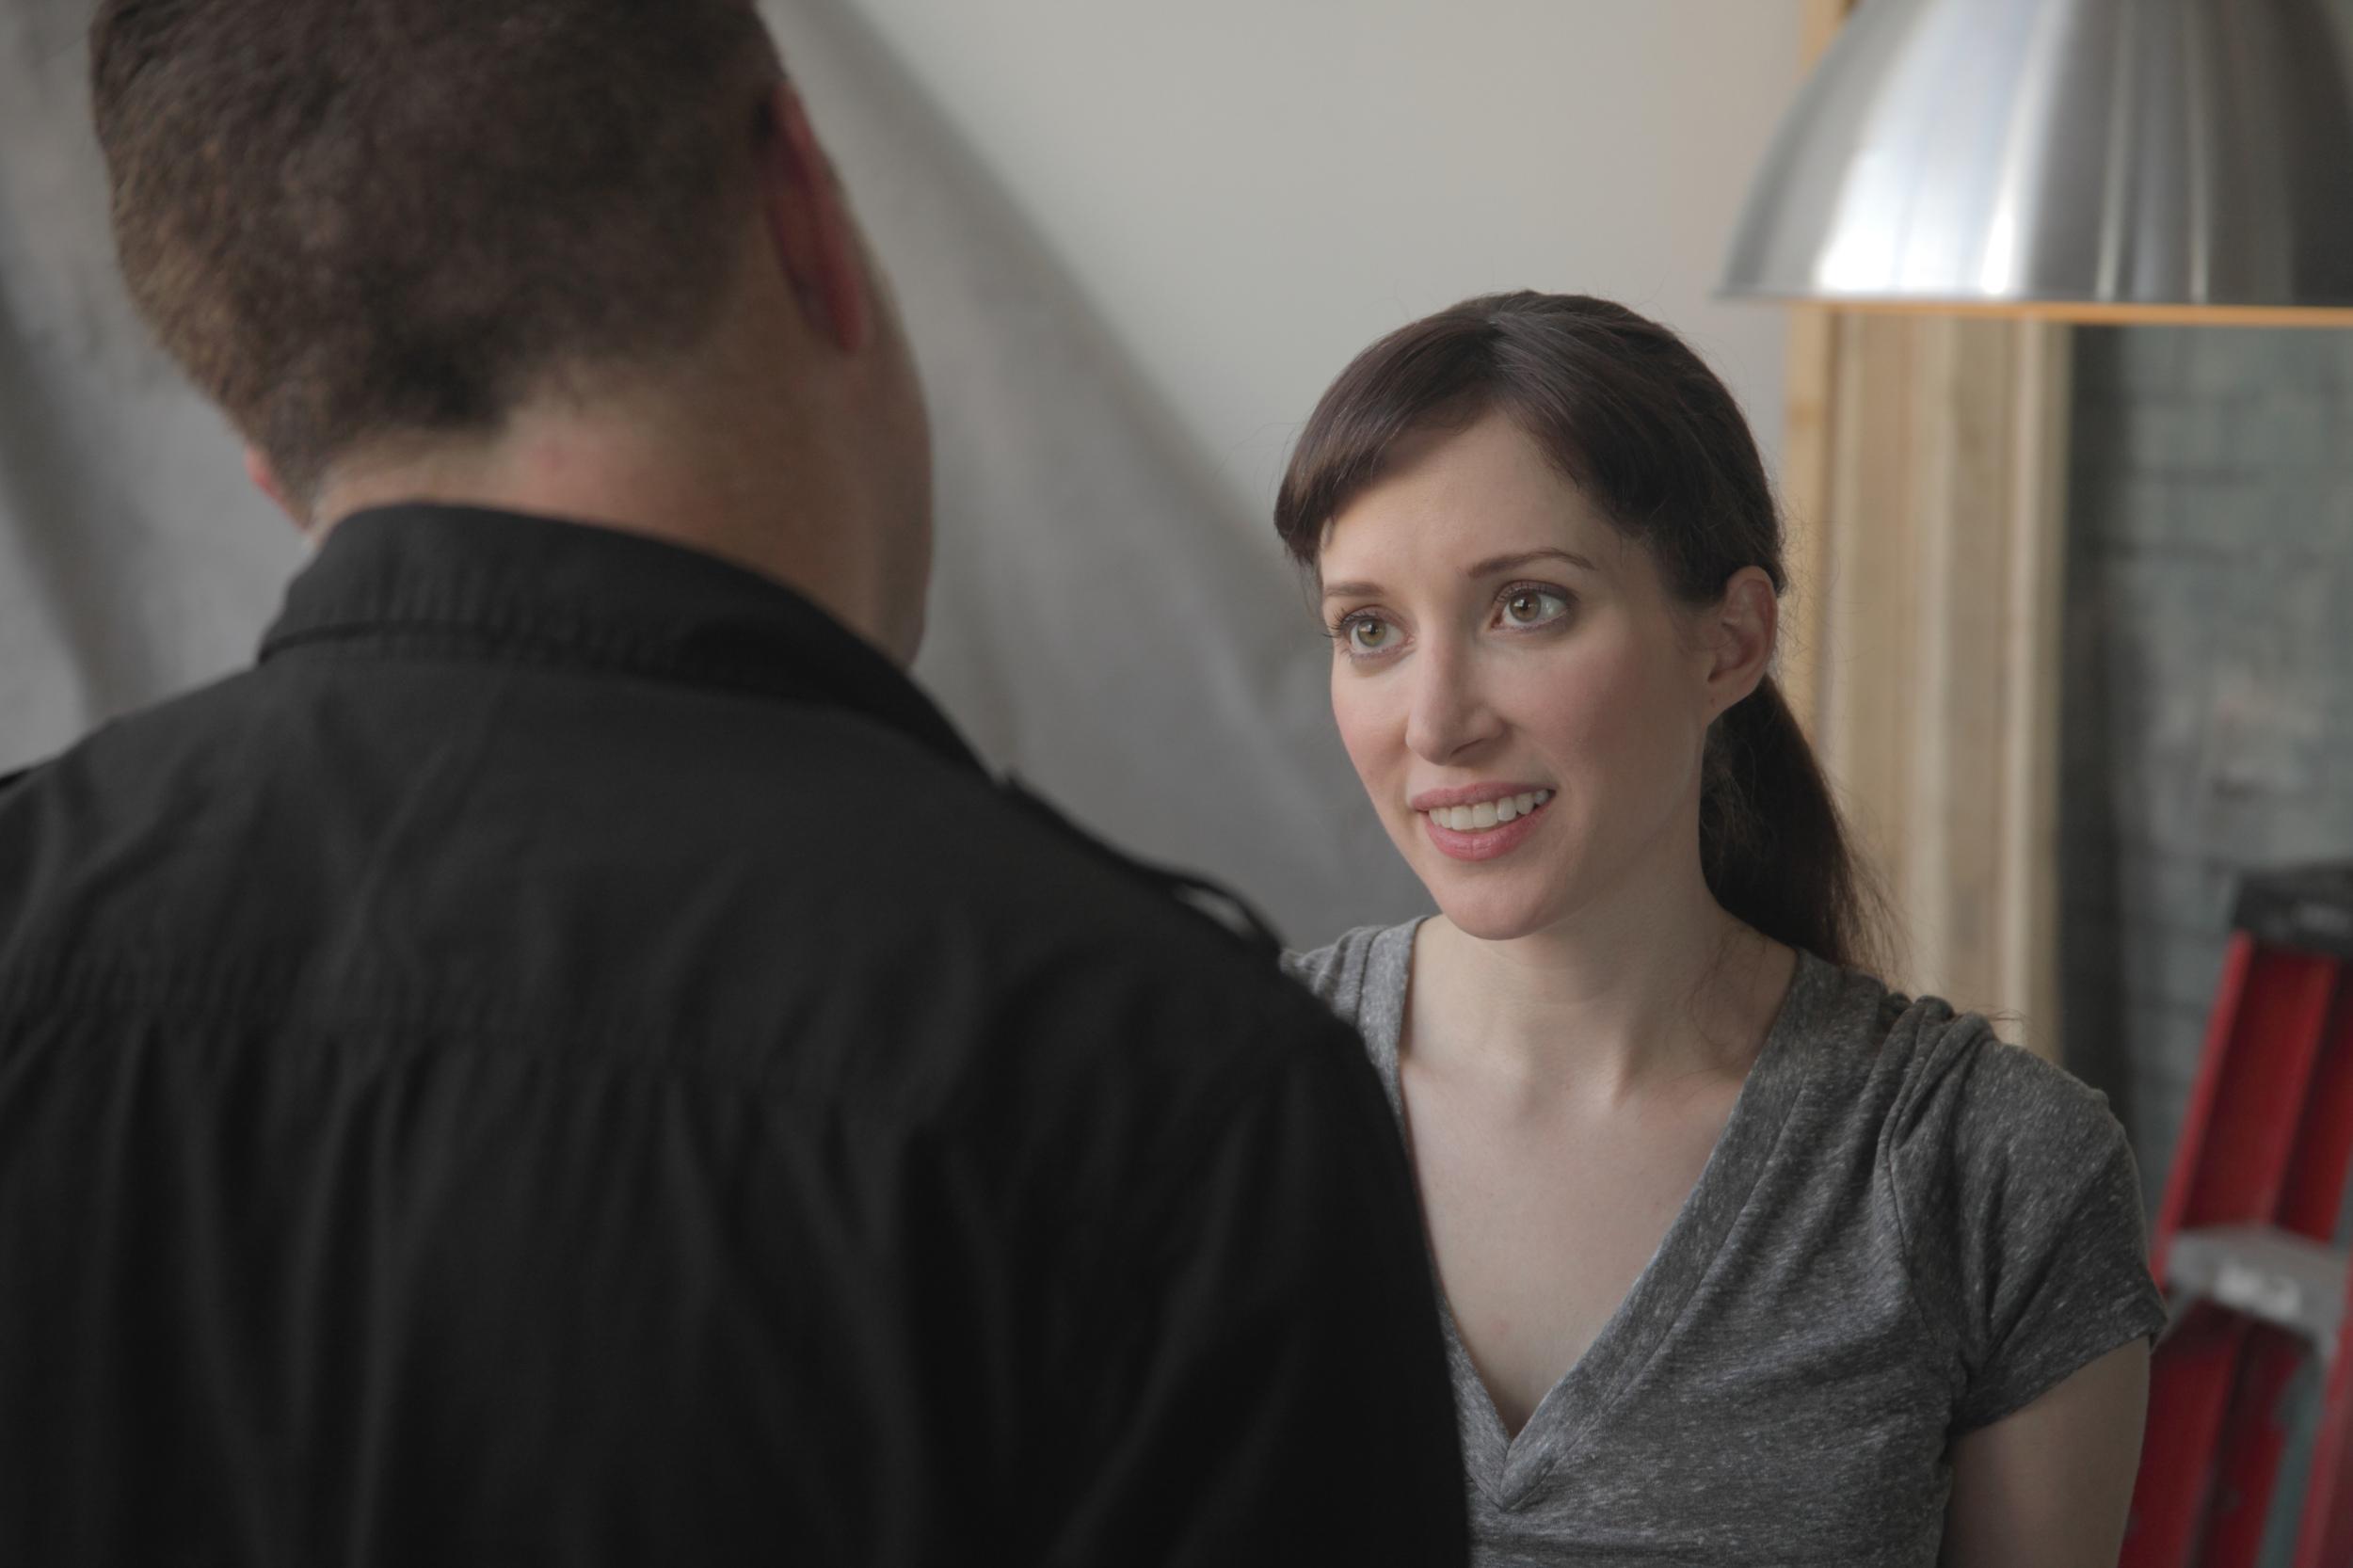 Writer/Director Jeff Roe discusses script elementswith RECA113 star FynnO'Hara (Photo: Dylan Sanford)